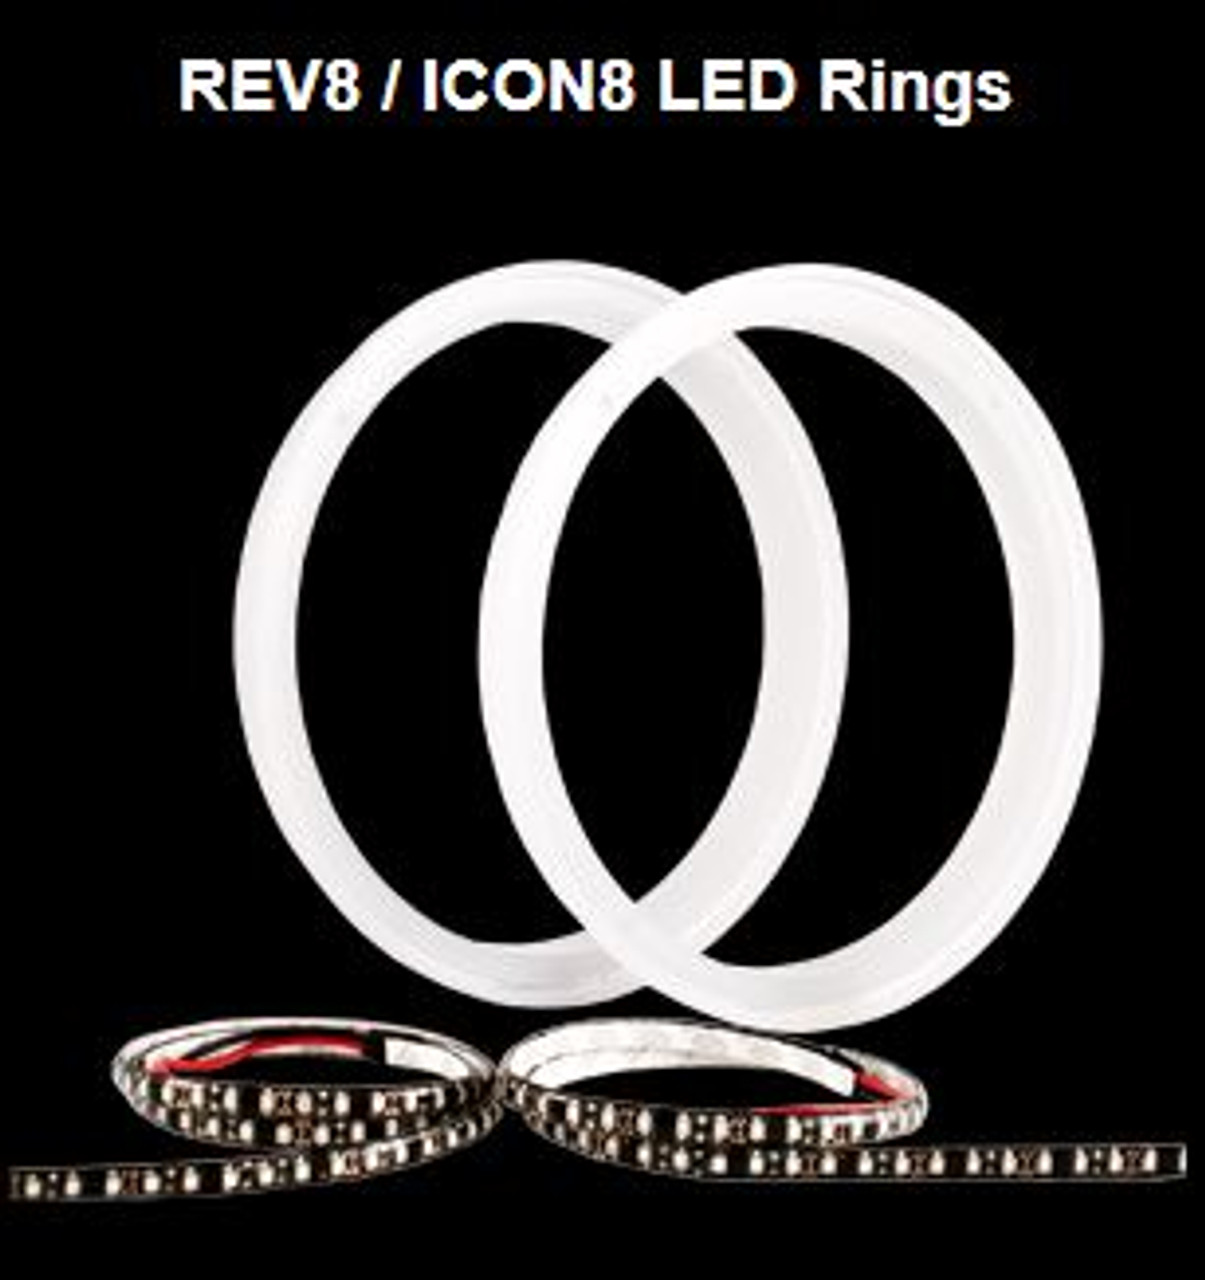 Icon 8 LED Rings